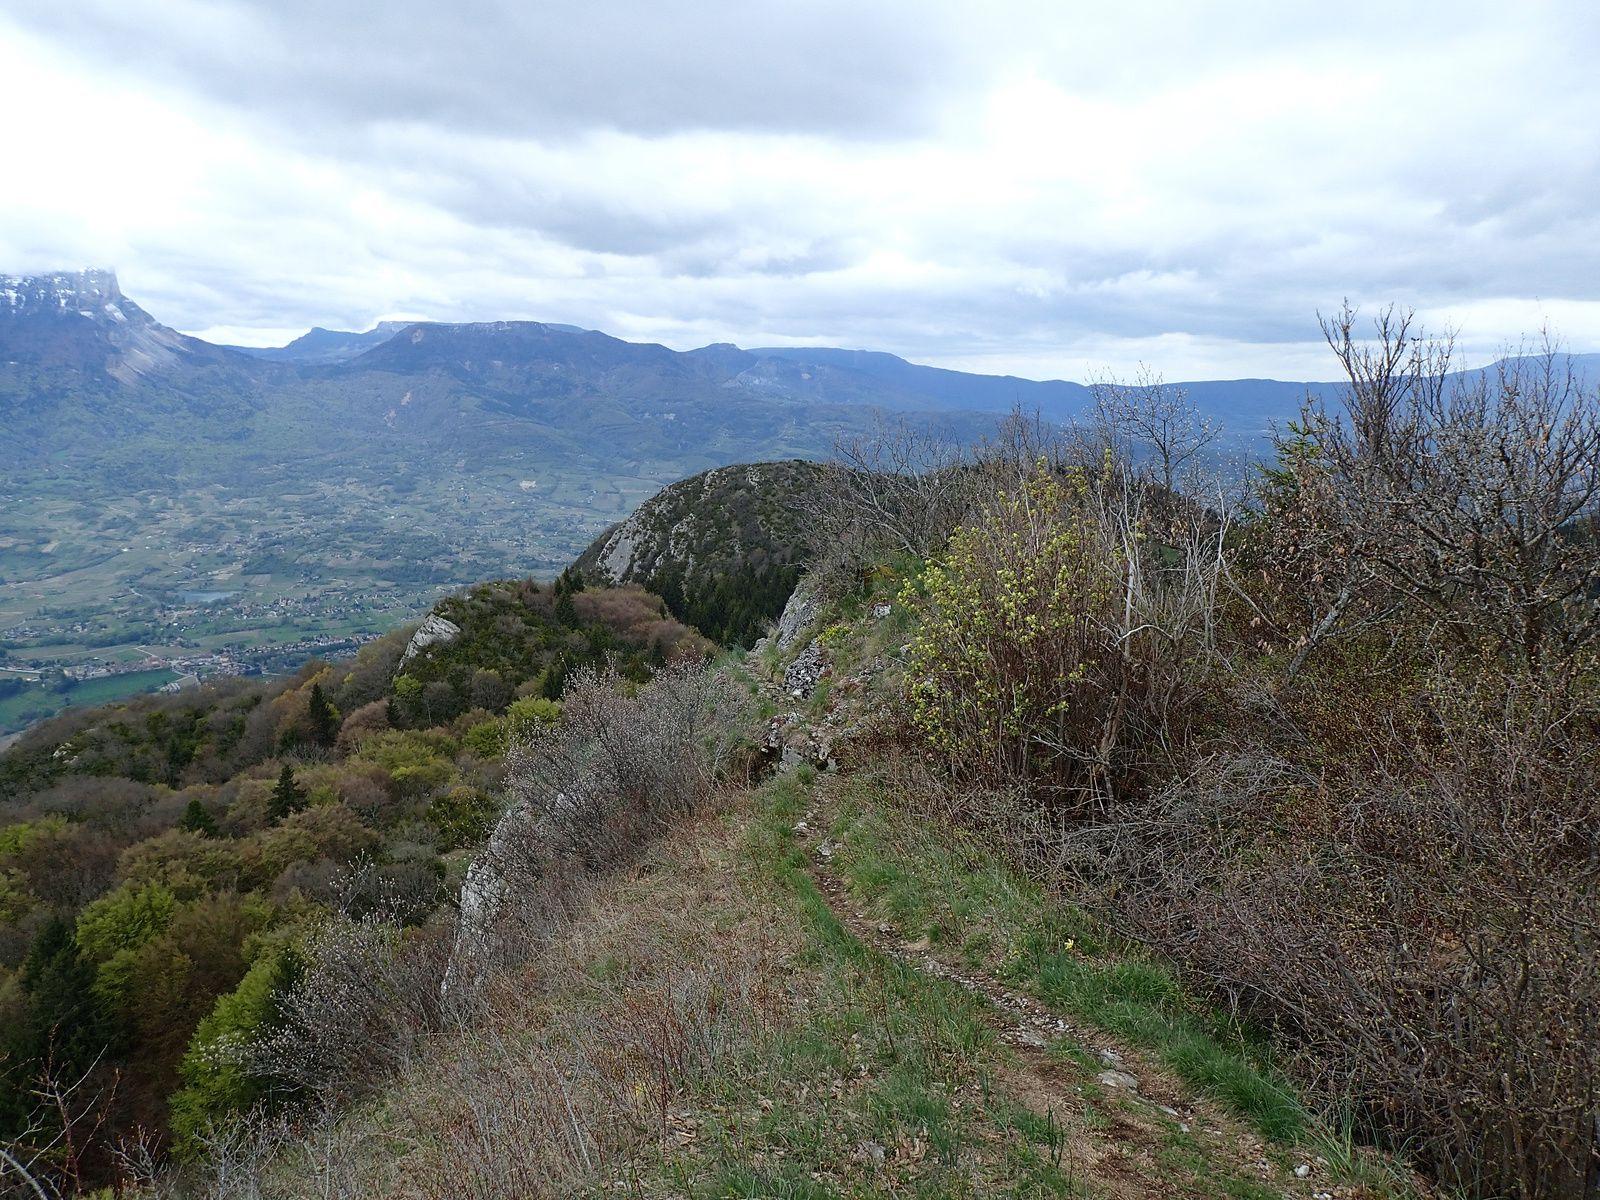 Roche du Guet: Traversée E>>>W, depuis Montmélian (1/2)